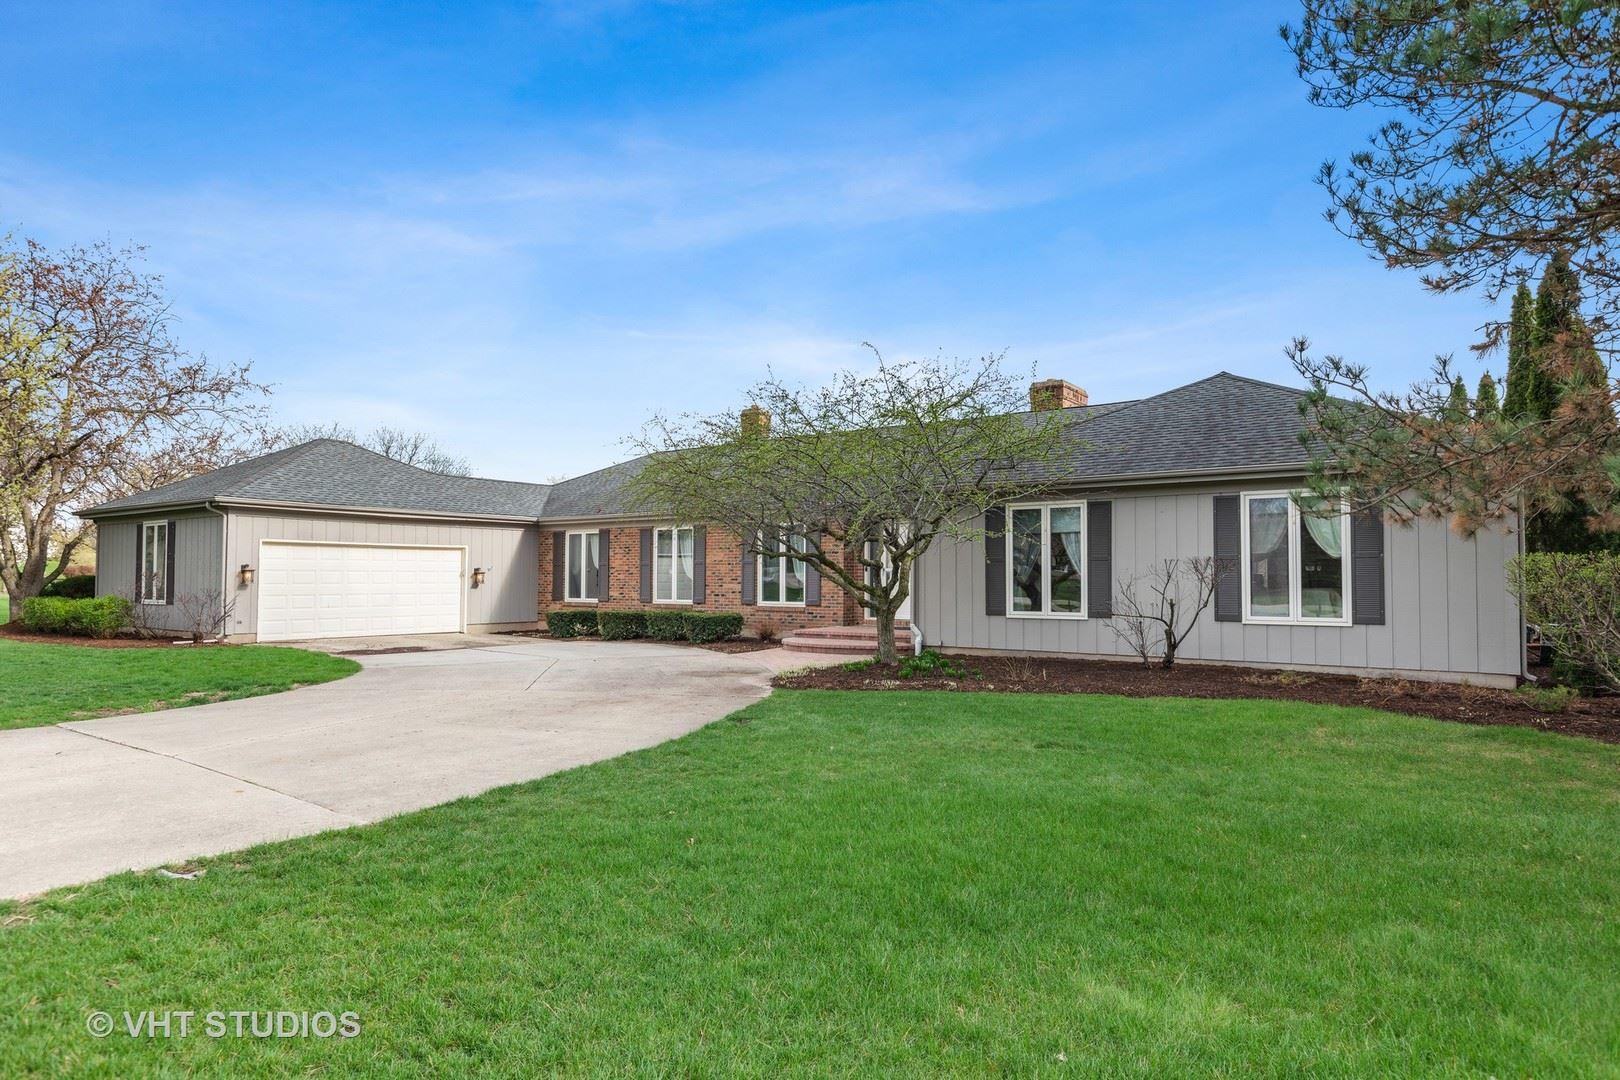 7125 Braemar Circle, Lakewood, IL 60014 - #: 11043285